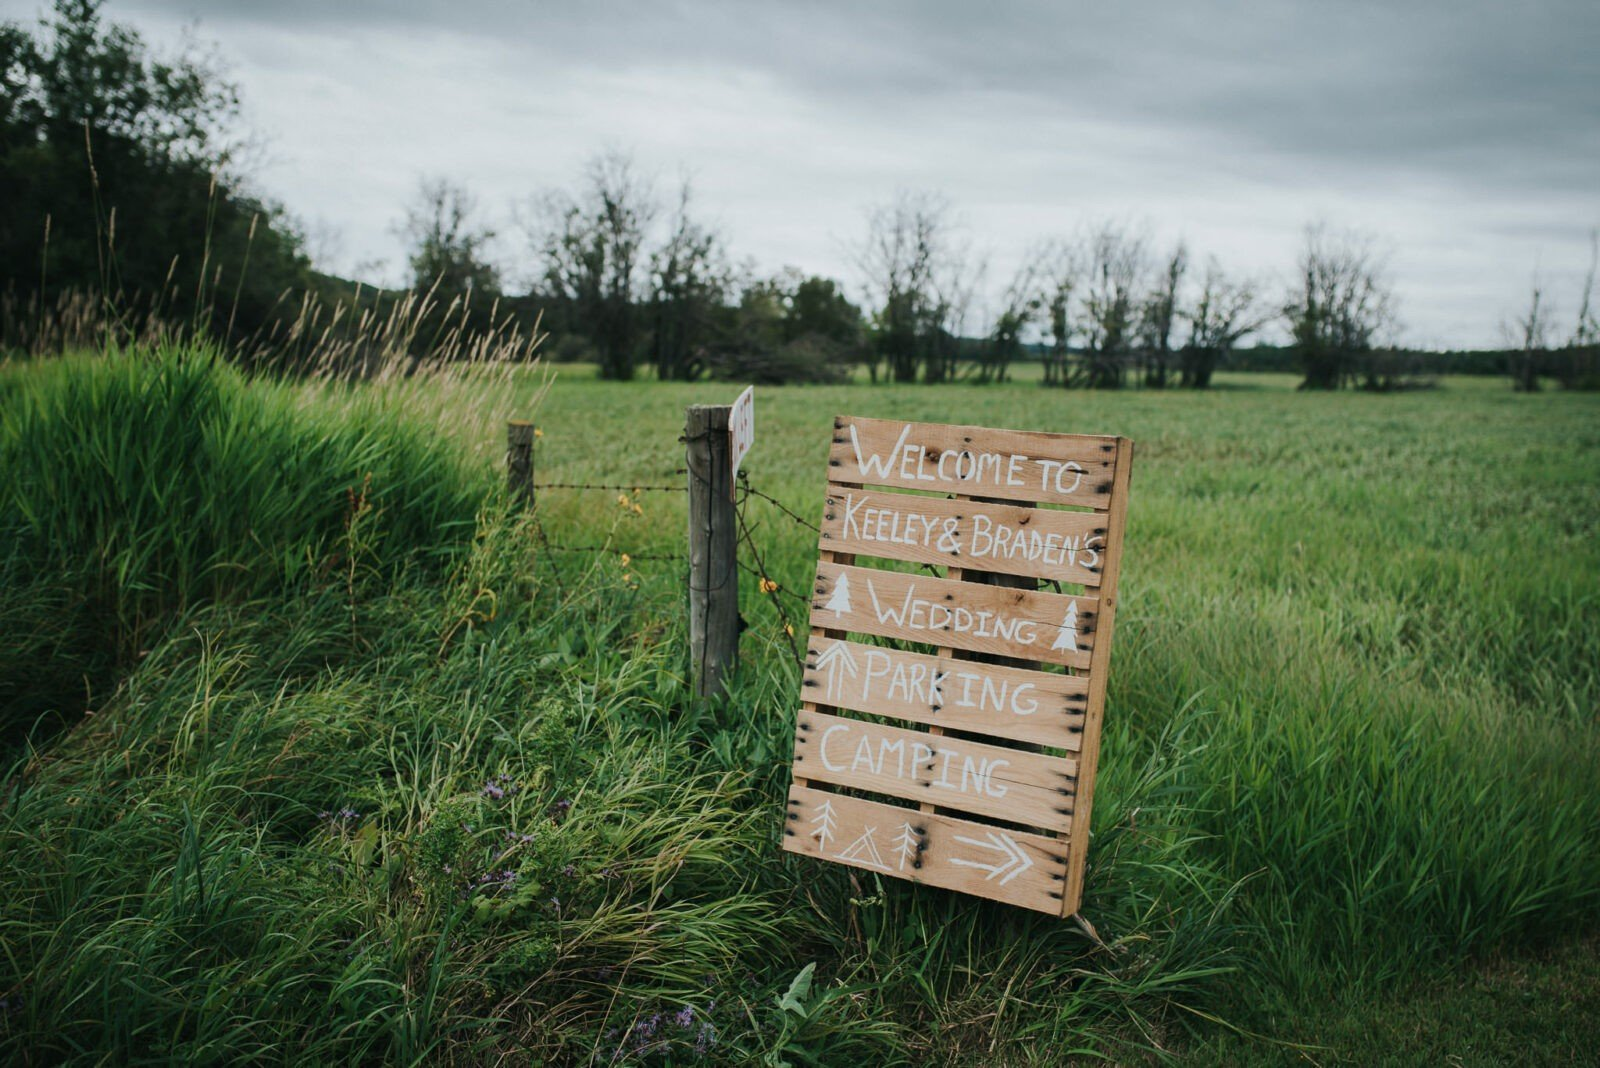 Entrance sign for woodland wedding